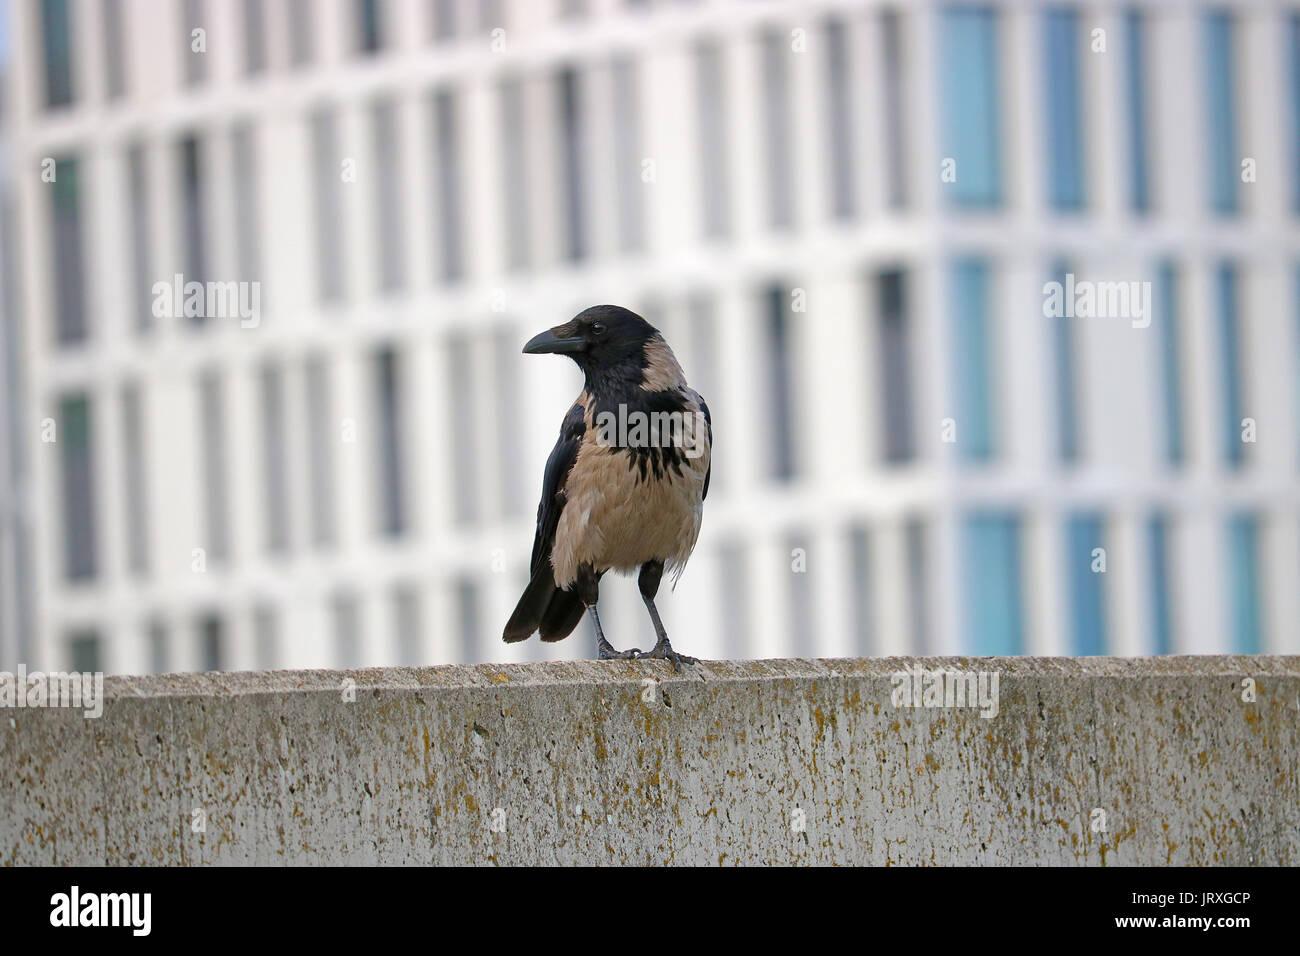 Bird Sitting On Wall Stock Photos & Bird Sitting On Wall Stock ...